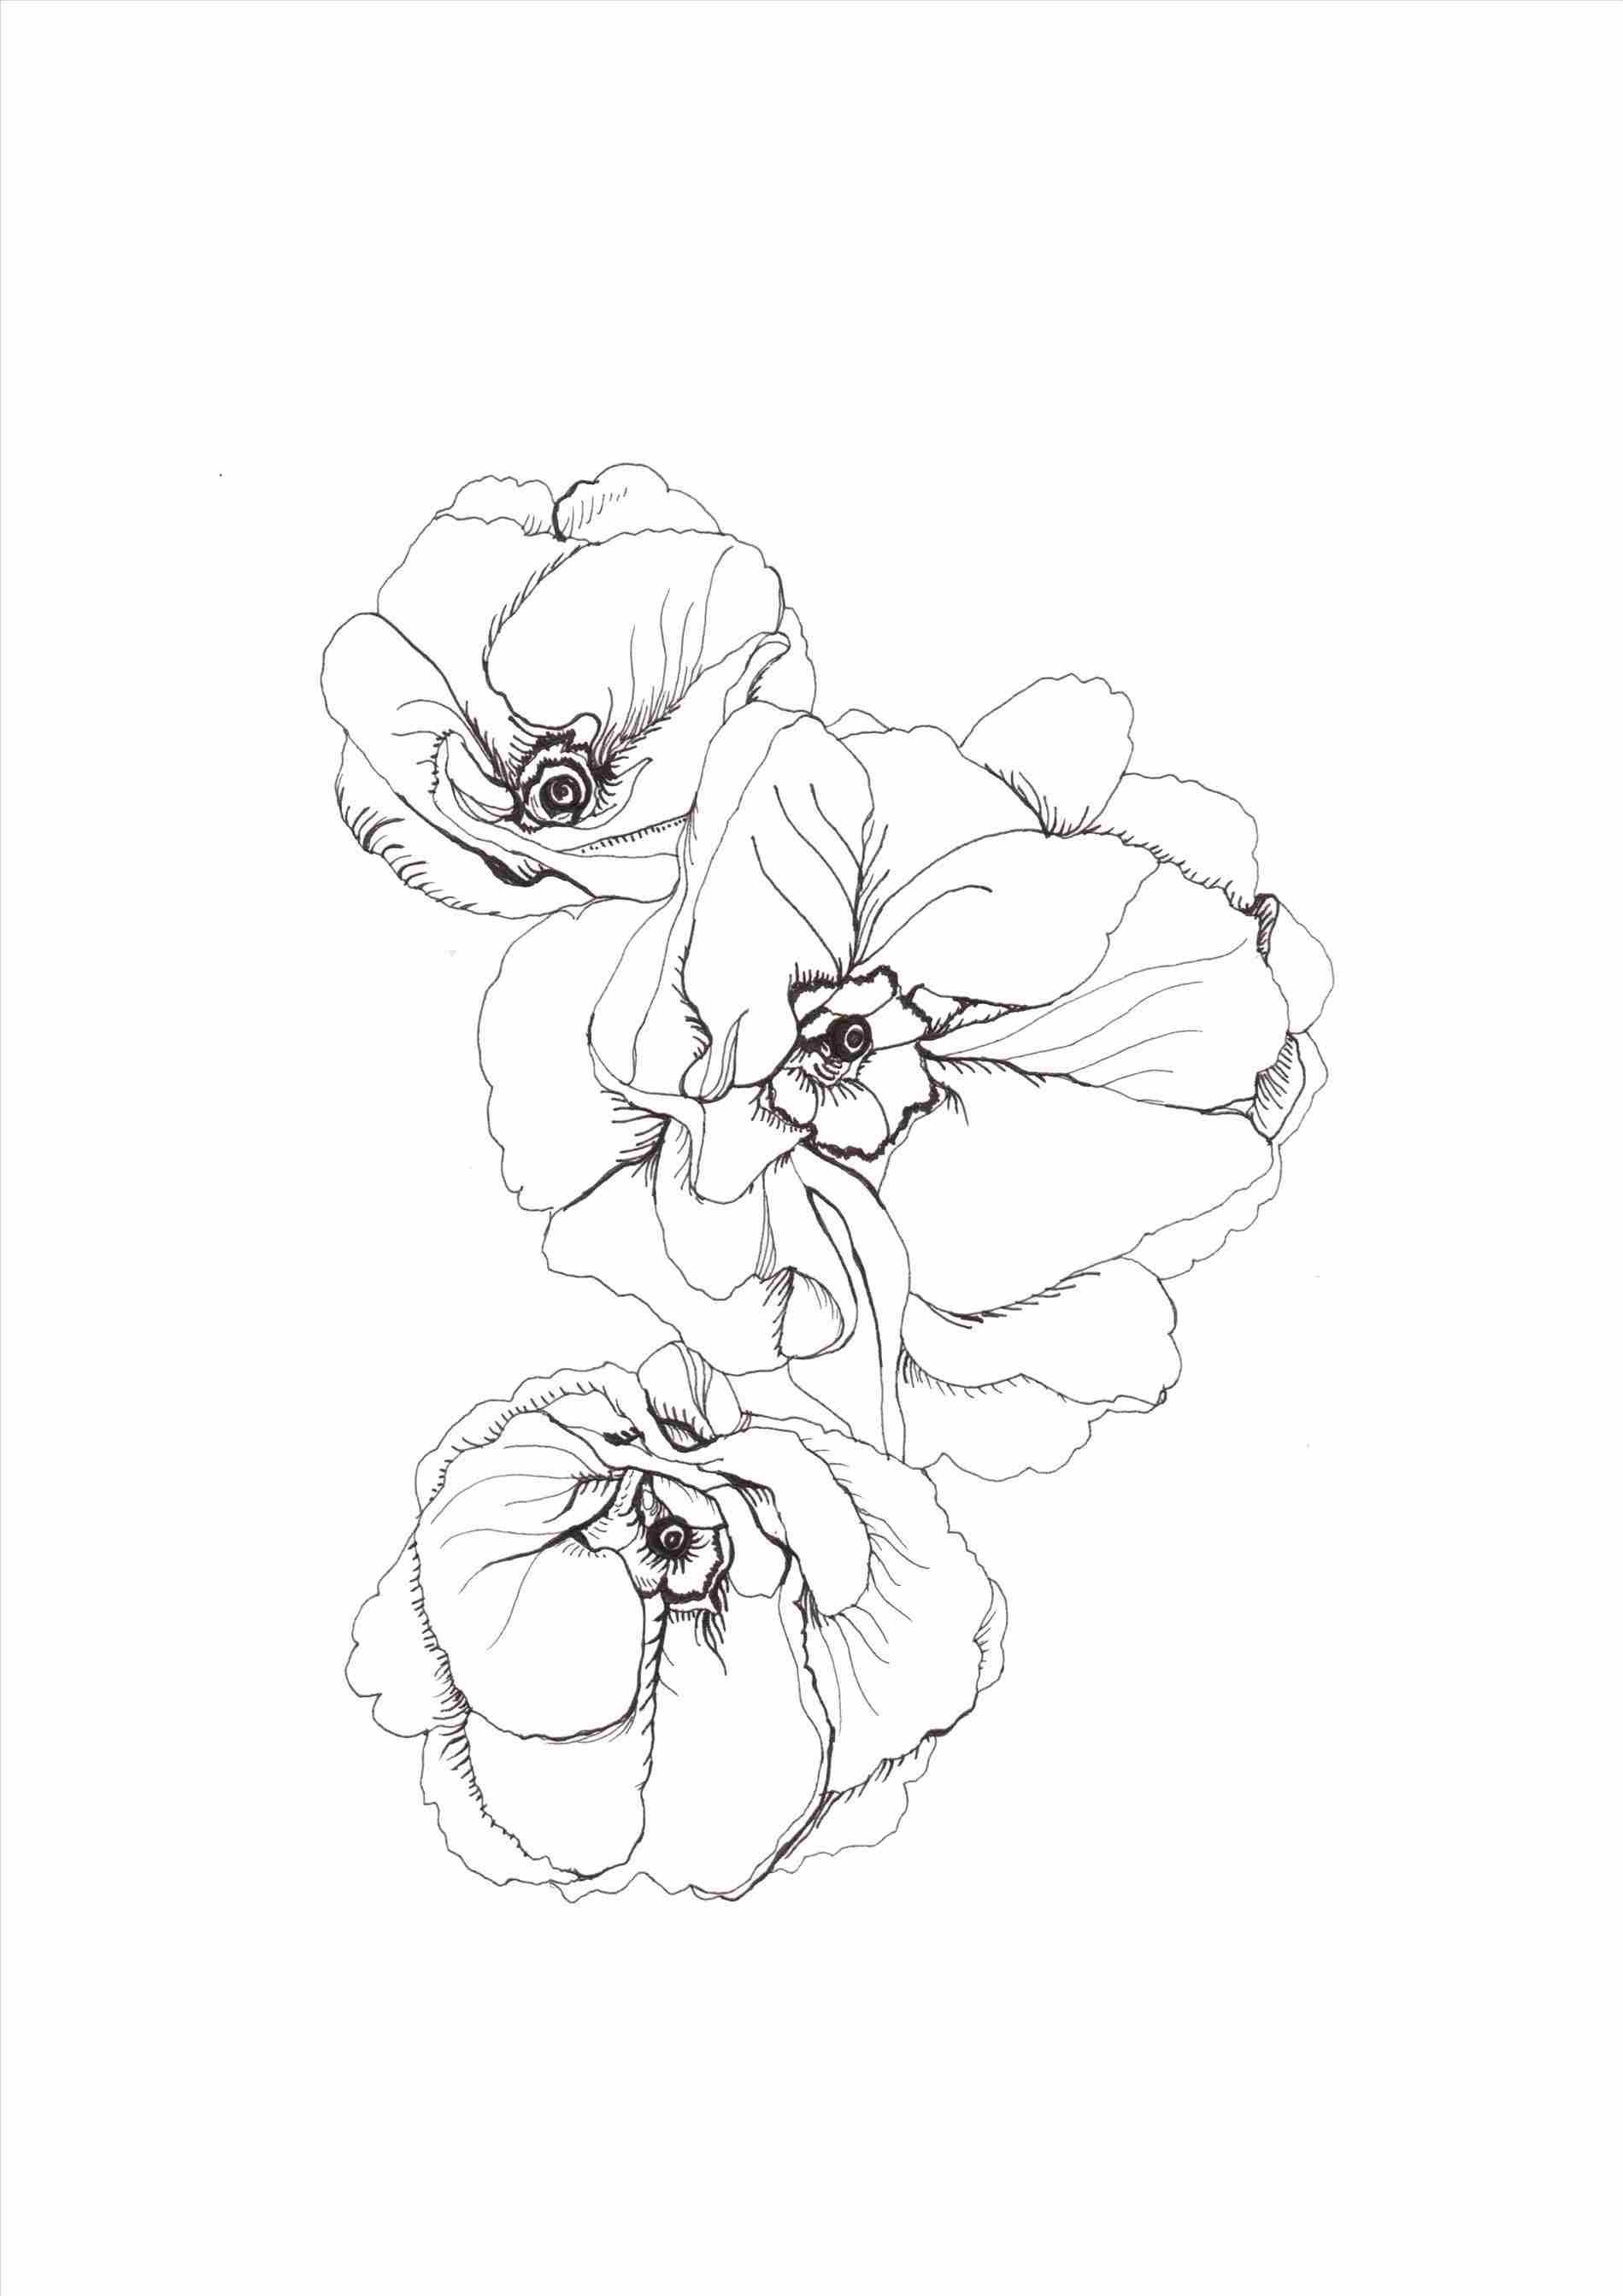 1899x2687 Bettyarchiedaily Garden Drawing Tumblr Firefluff Blog Video Game